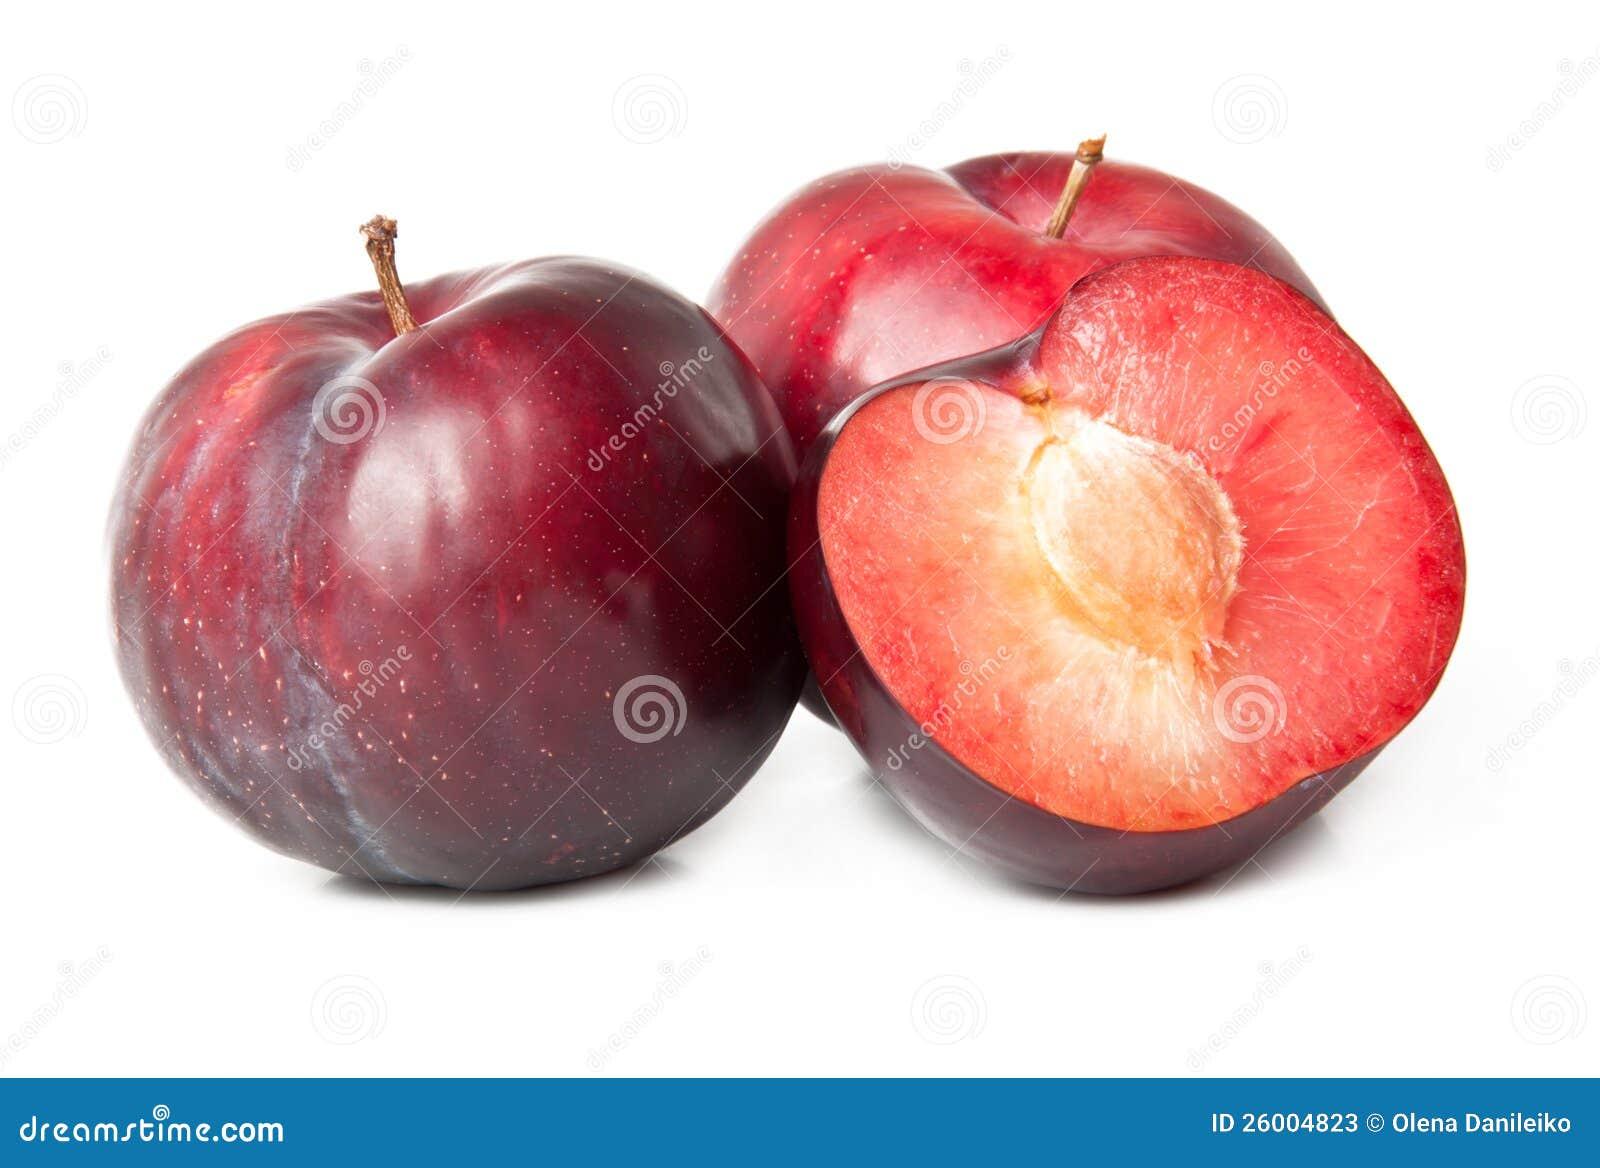 Red plum fruit stock photos image 26004823